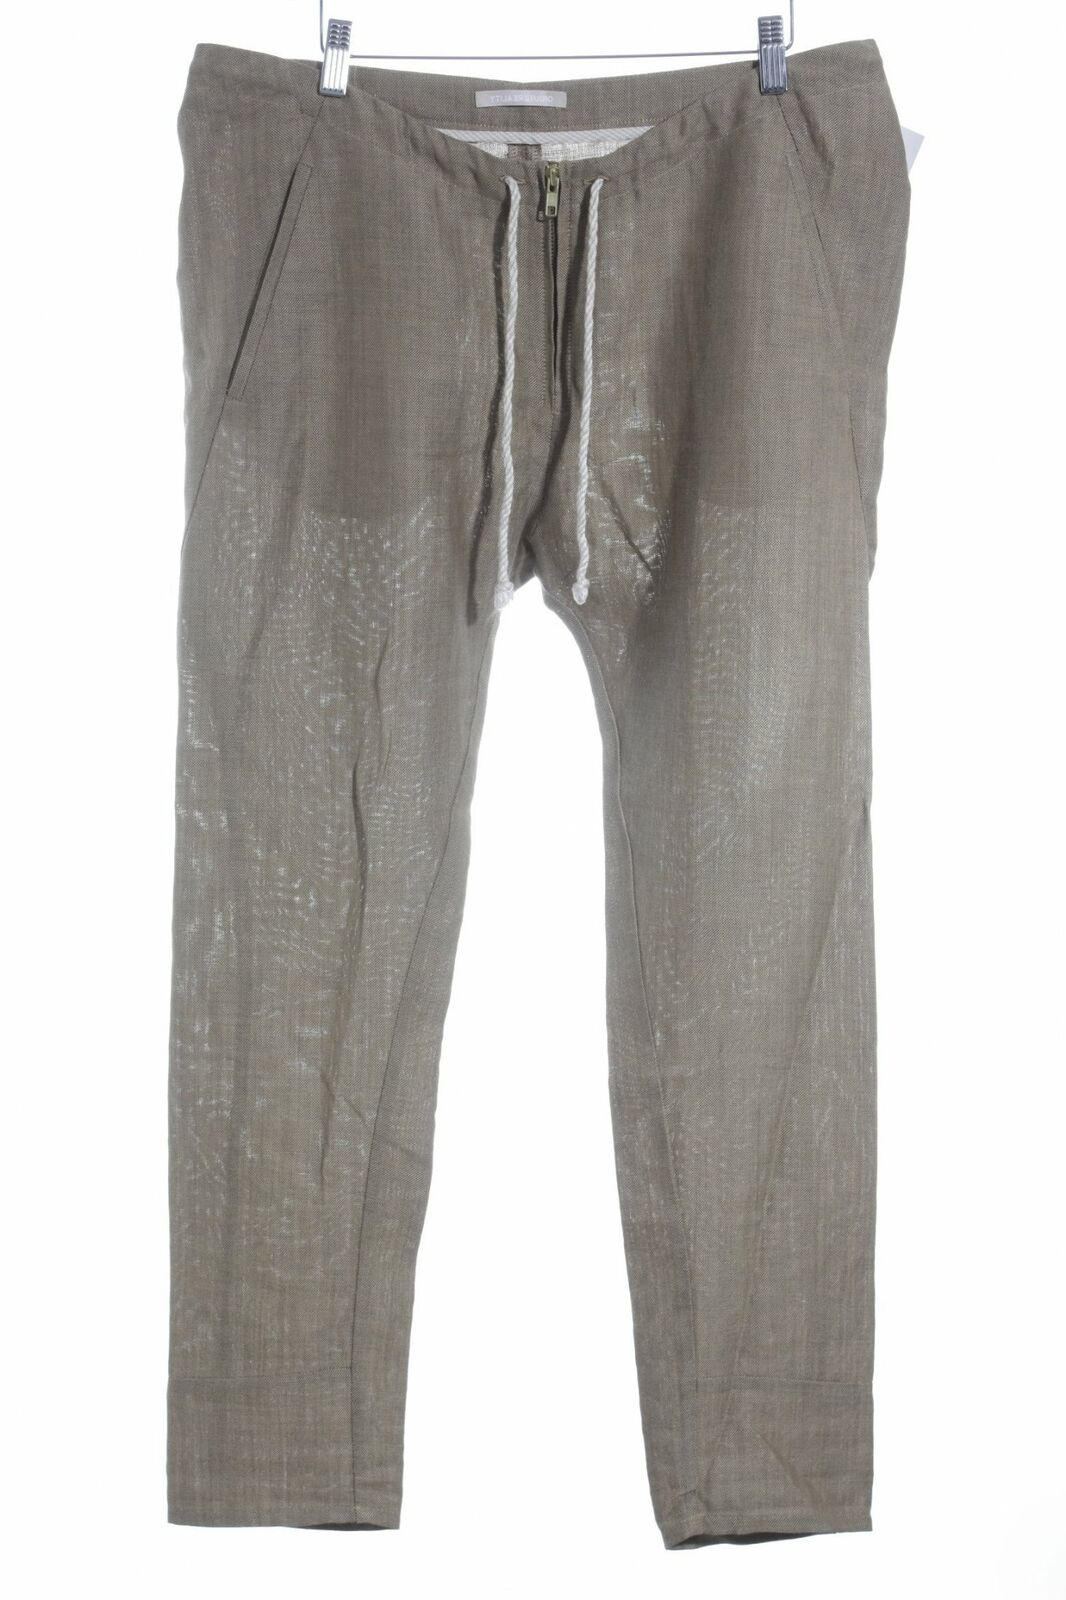 Reality studio Tessuto Pantaloni Sabbia Marronee Casual-look da donna tg. de 40 Pantaloni Trousers